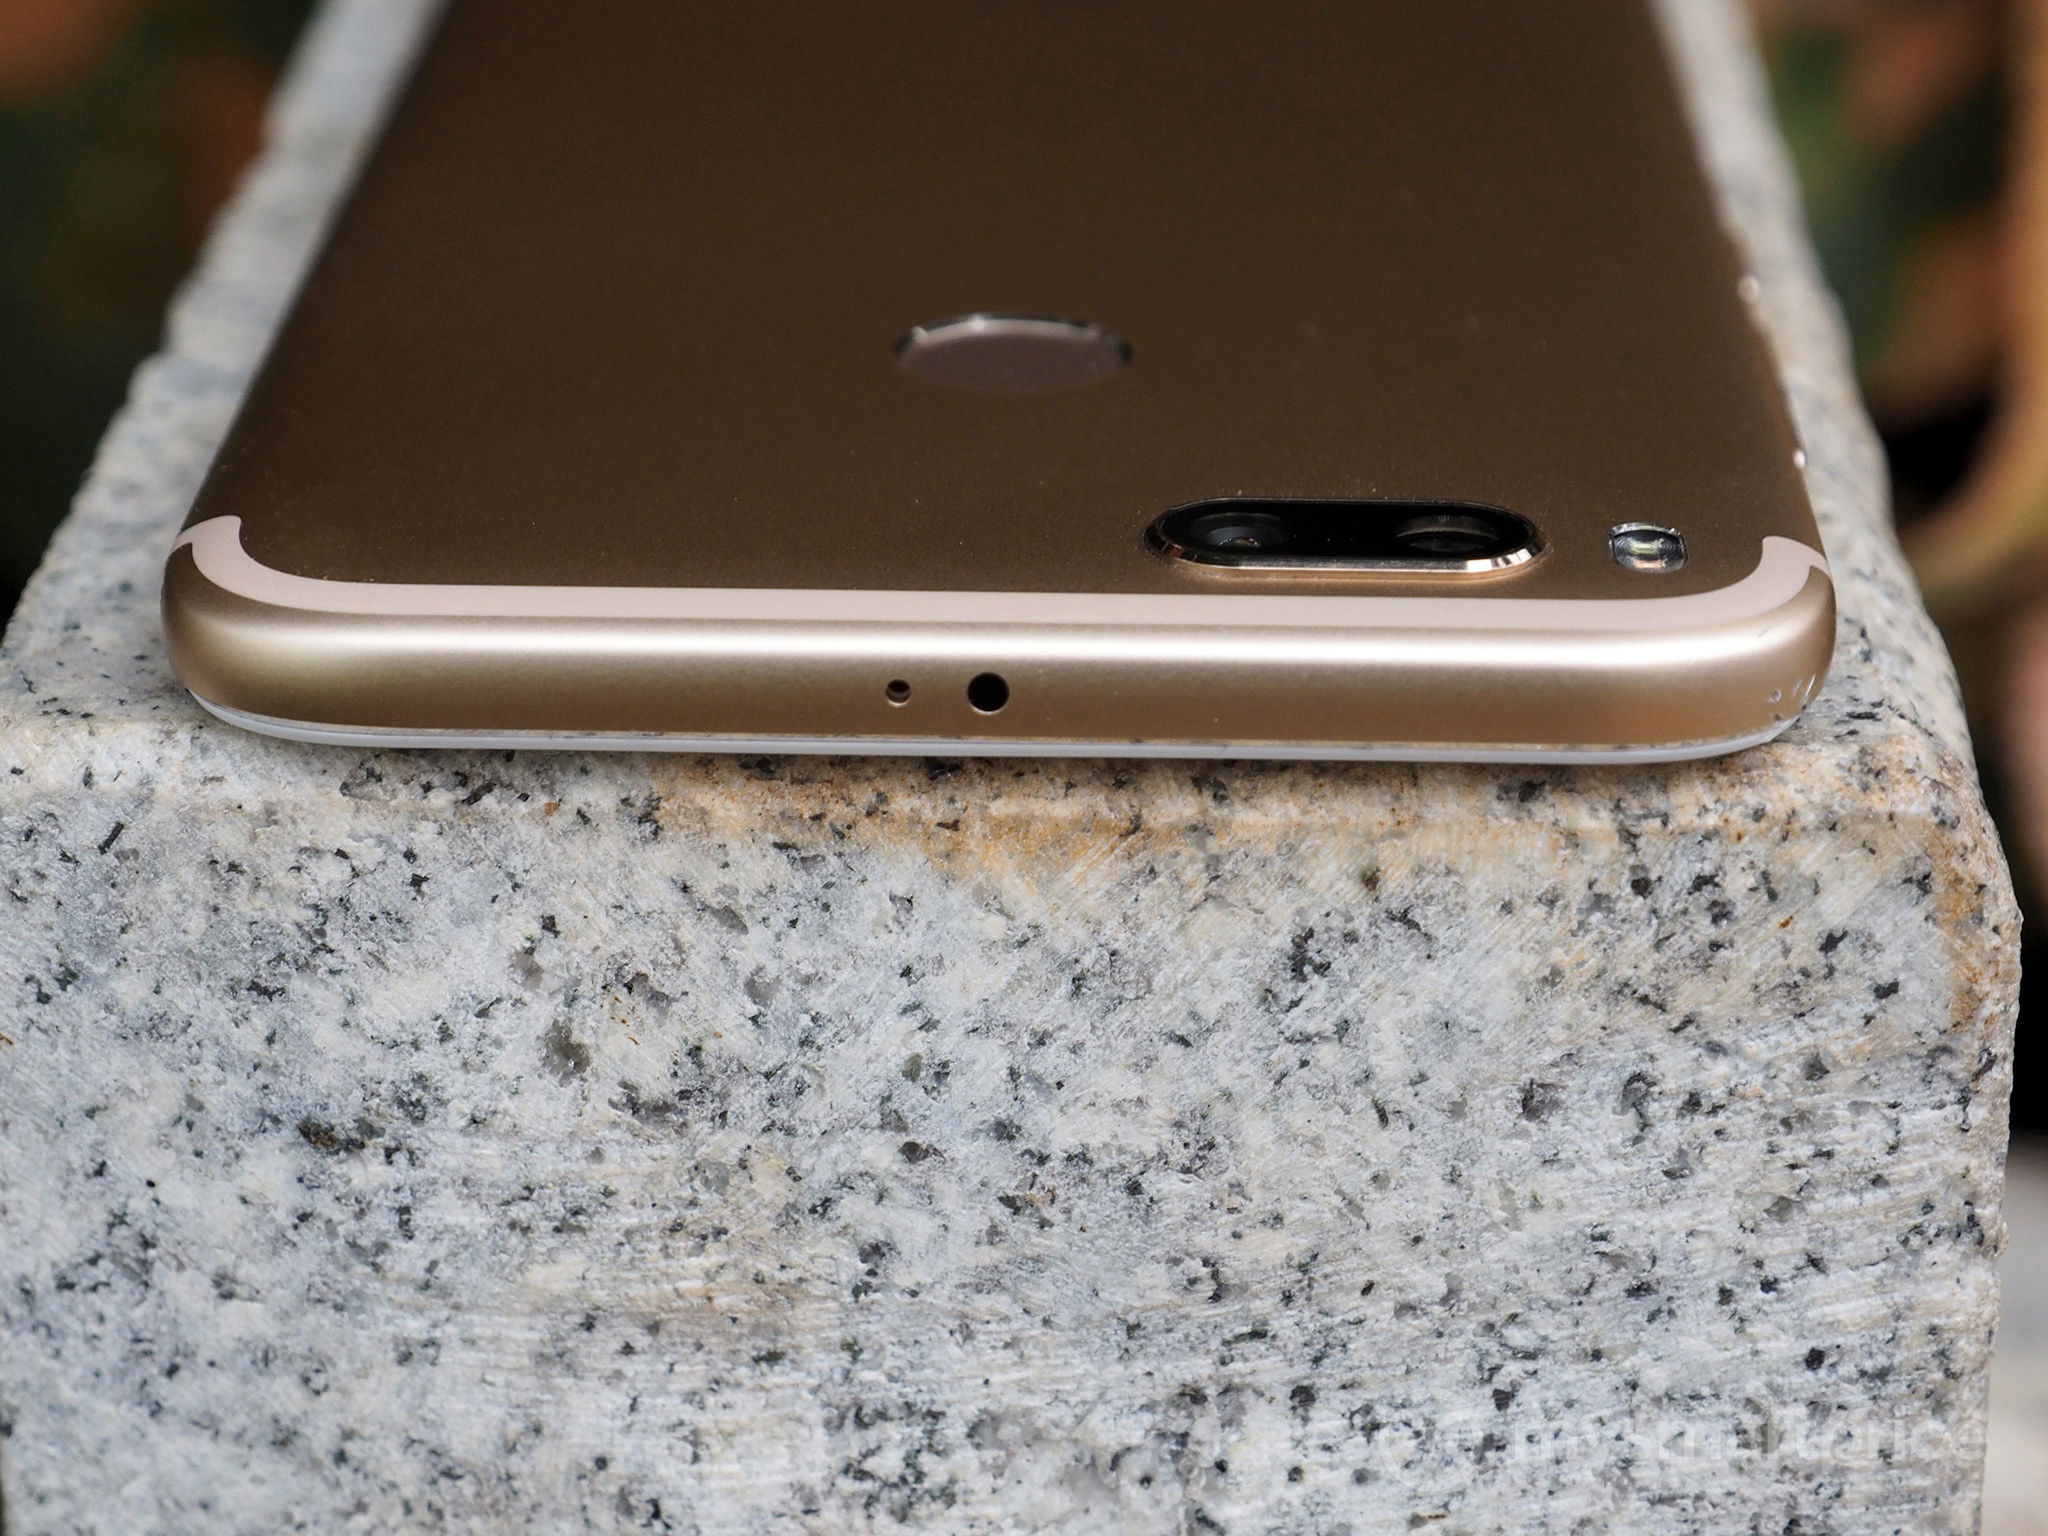 Xiaomi Mi A1 review: A budget masterstroke by Xiaomi